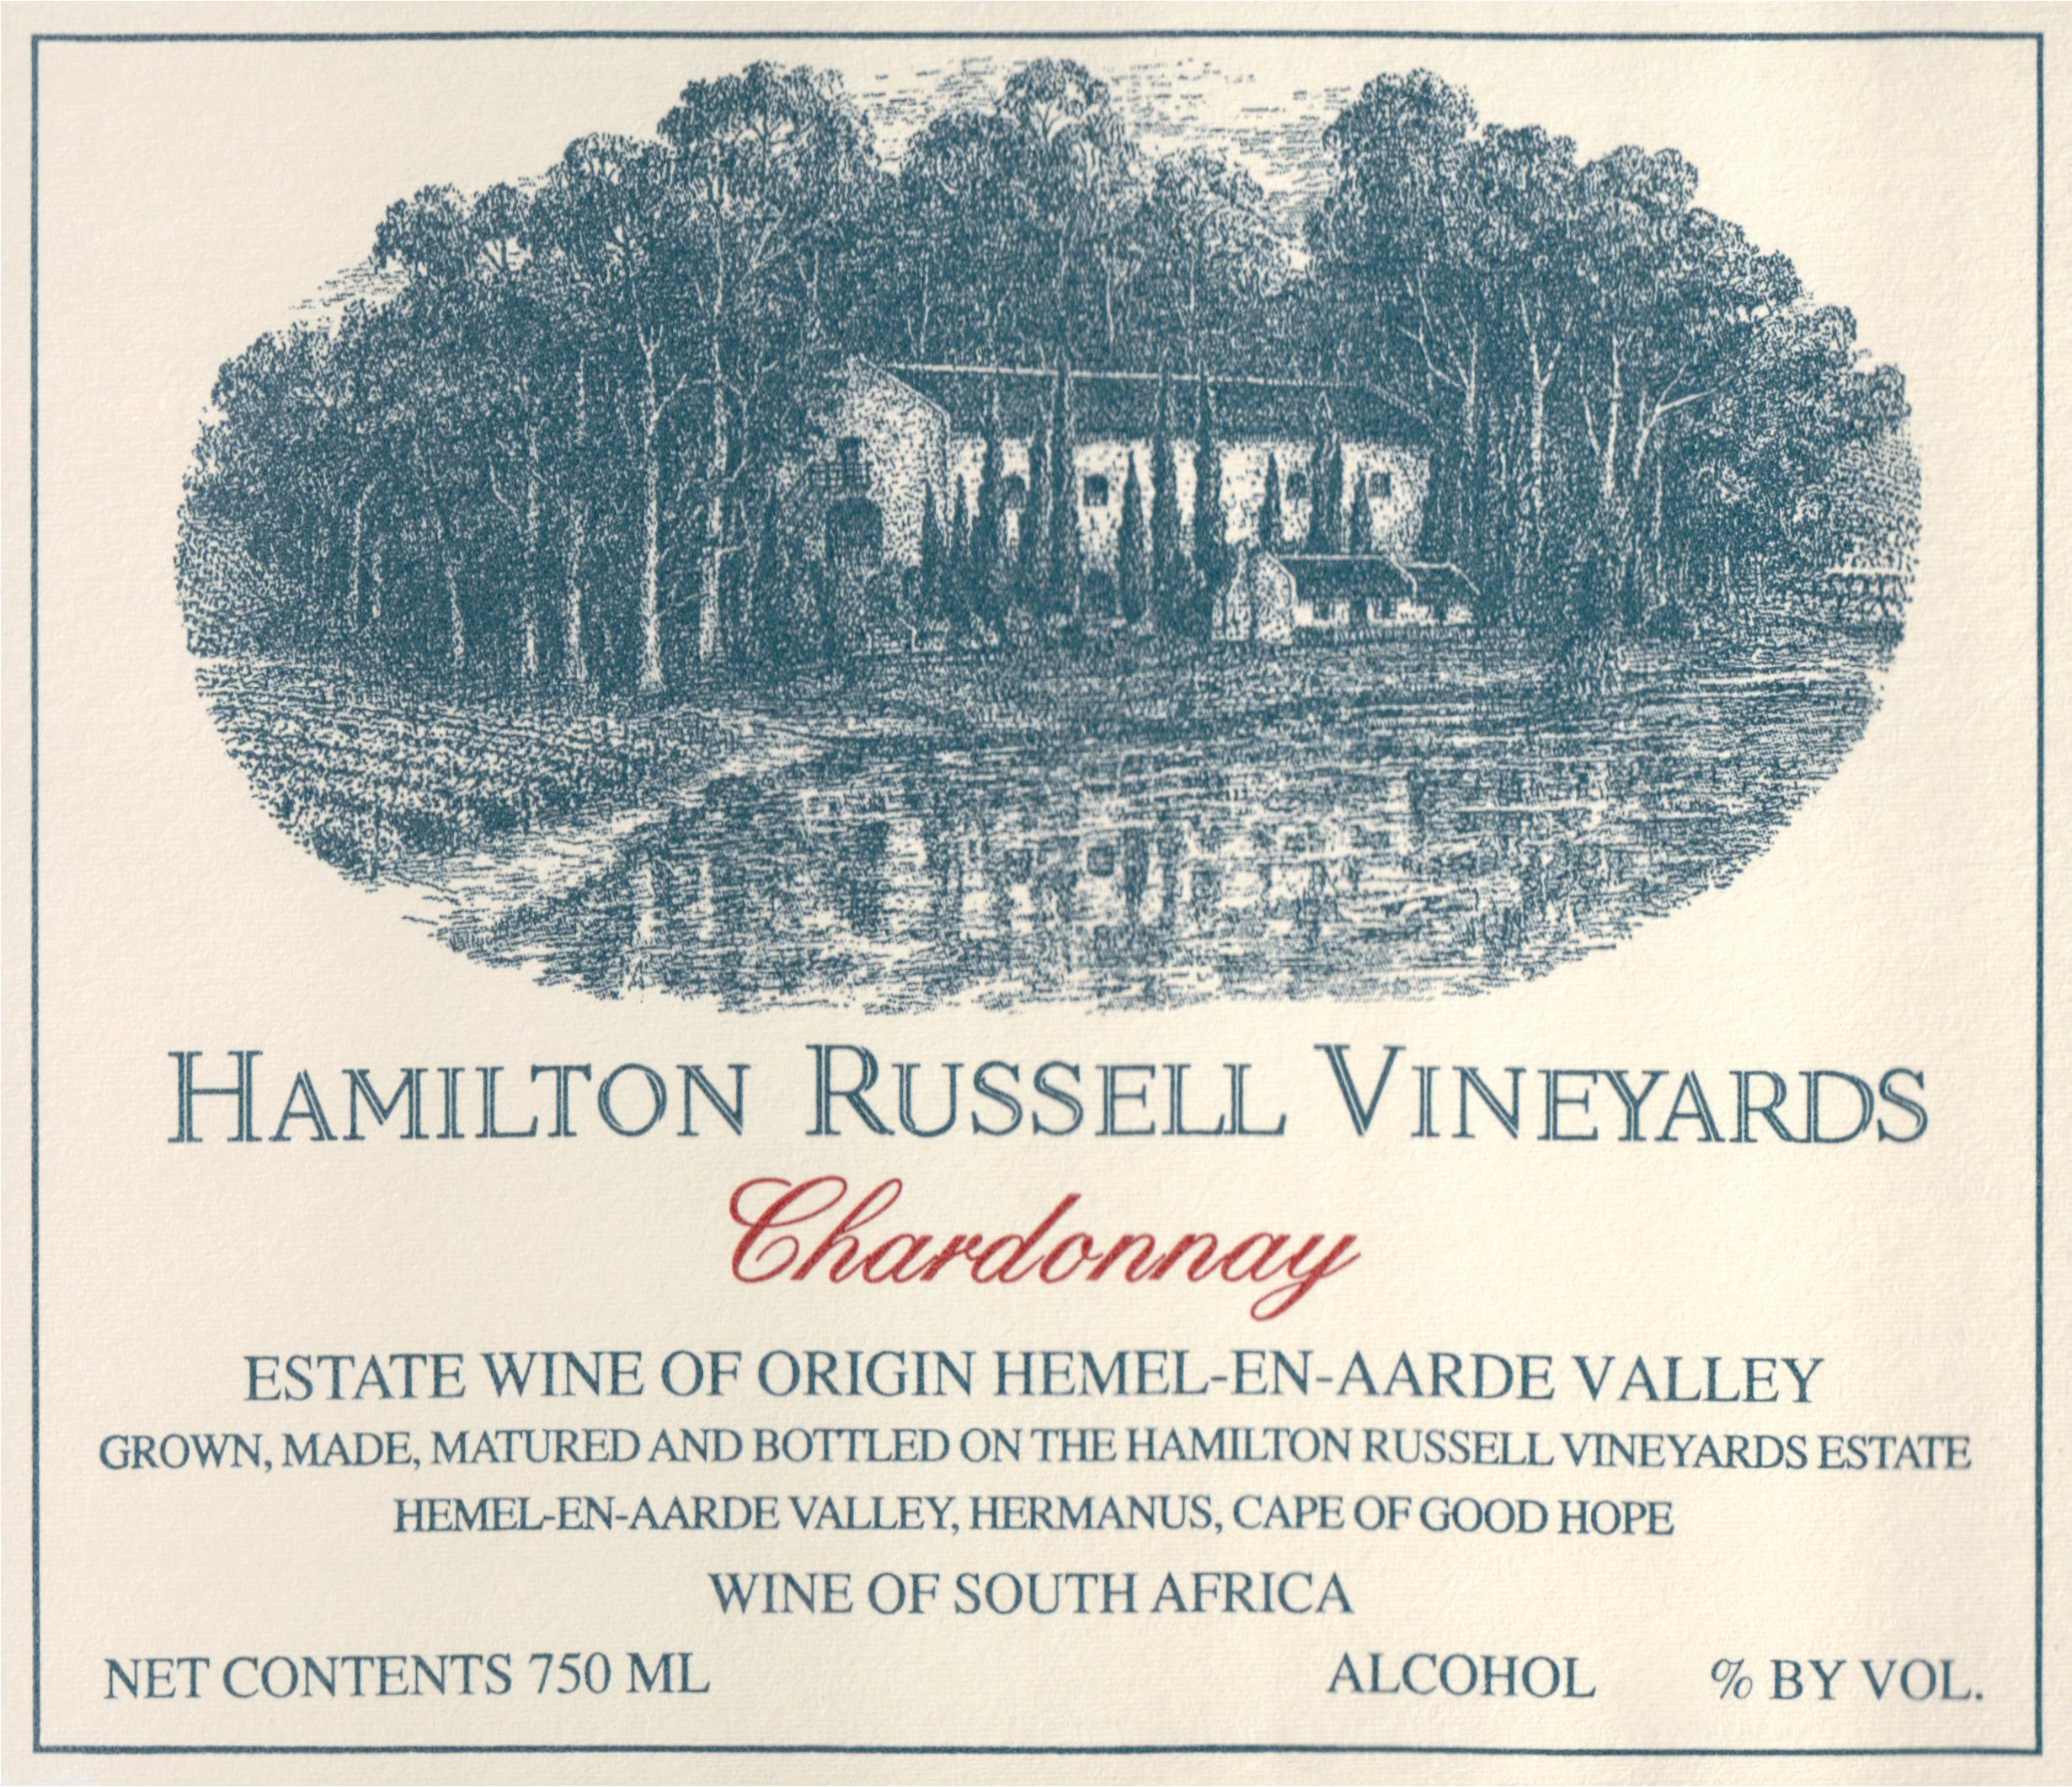 Hamilton Russell Vineyards Chardonnay 2019